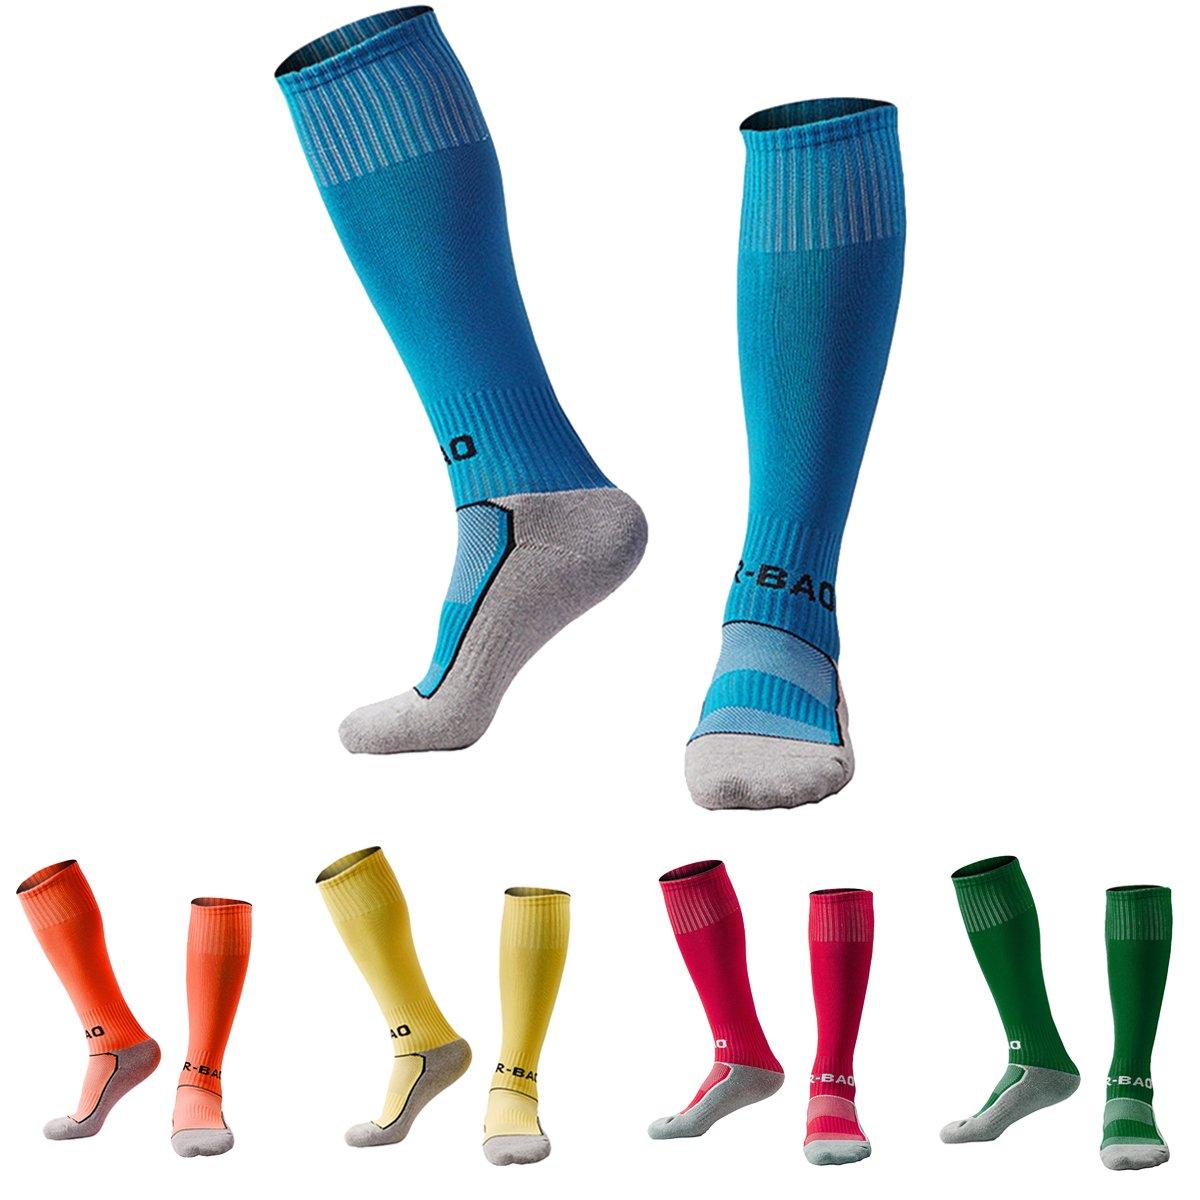 Soccer Socks for Little Boys Girls 5 Pack (Blue/Orange/Yellow/Rose Red/Dark Green) XS by KALAKIDS